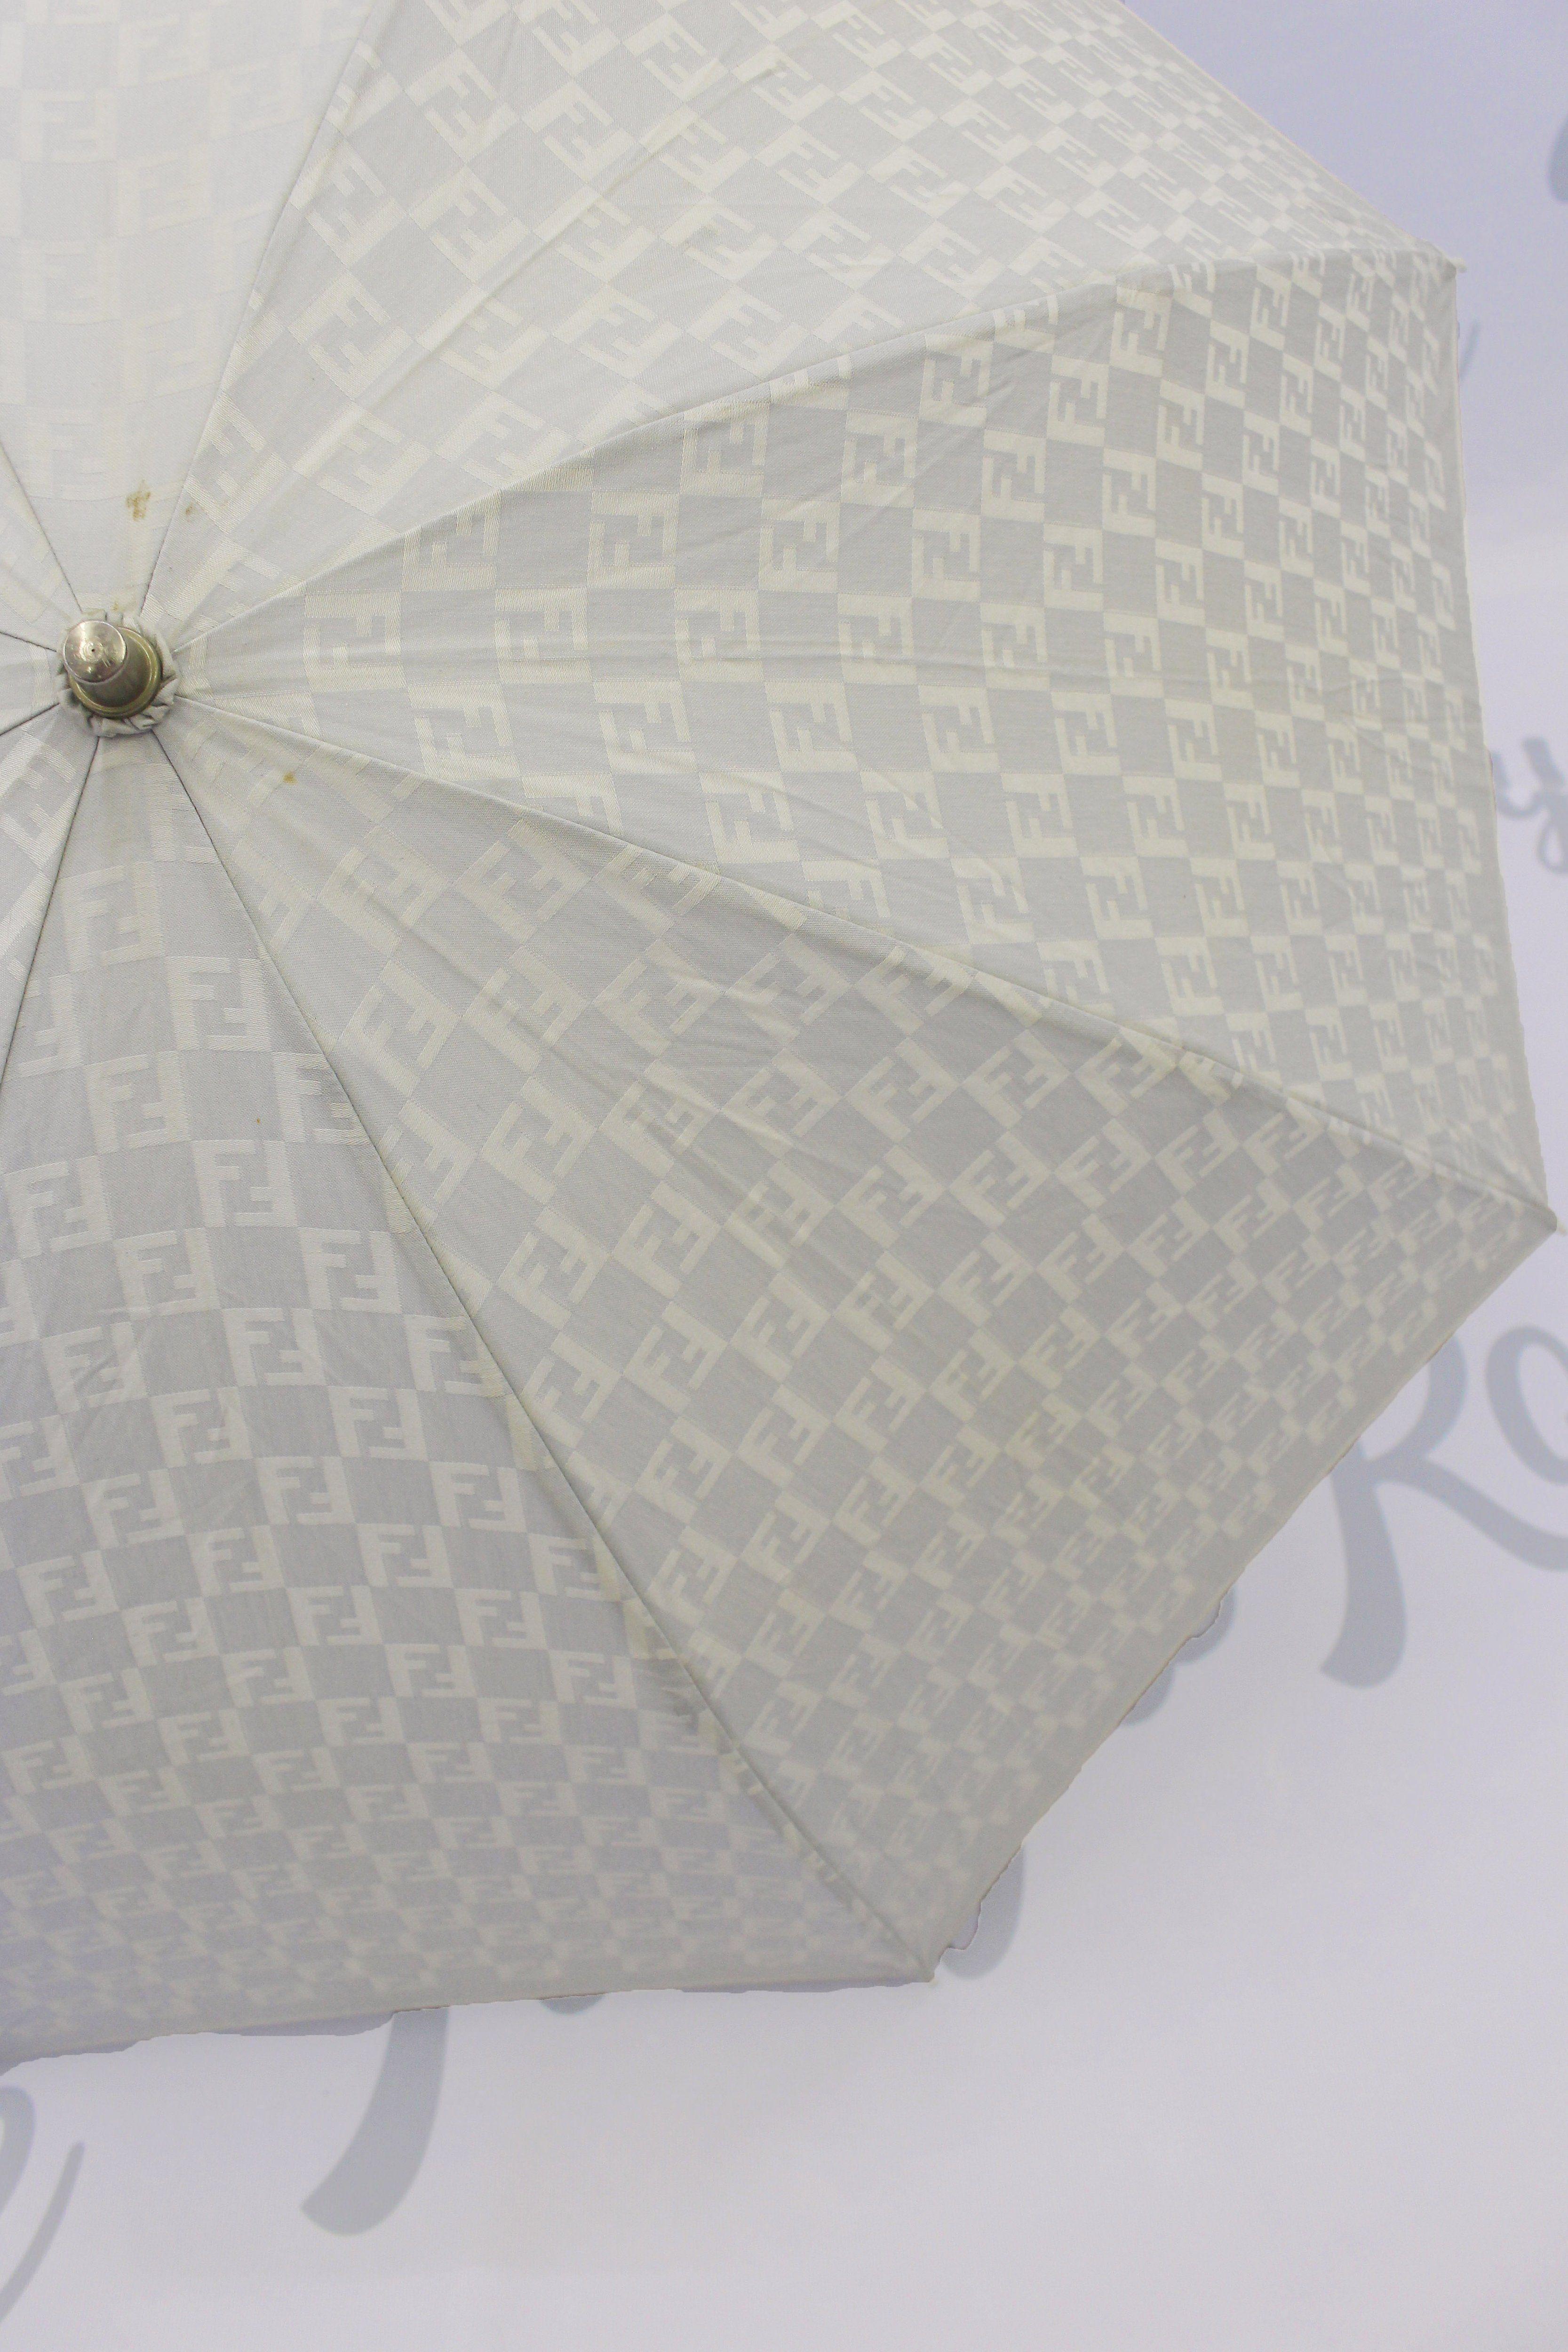 Vintage Fendi Ff Zucca Logo Print Umbrella Tokyo Roses Vintage In 2020 Print Umbrella Fendi Umbrella